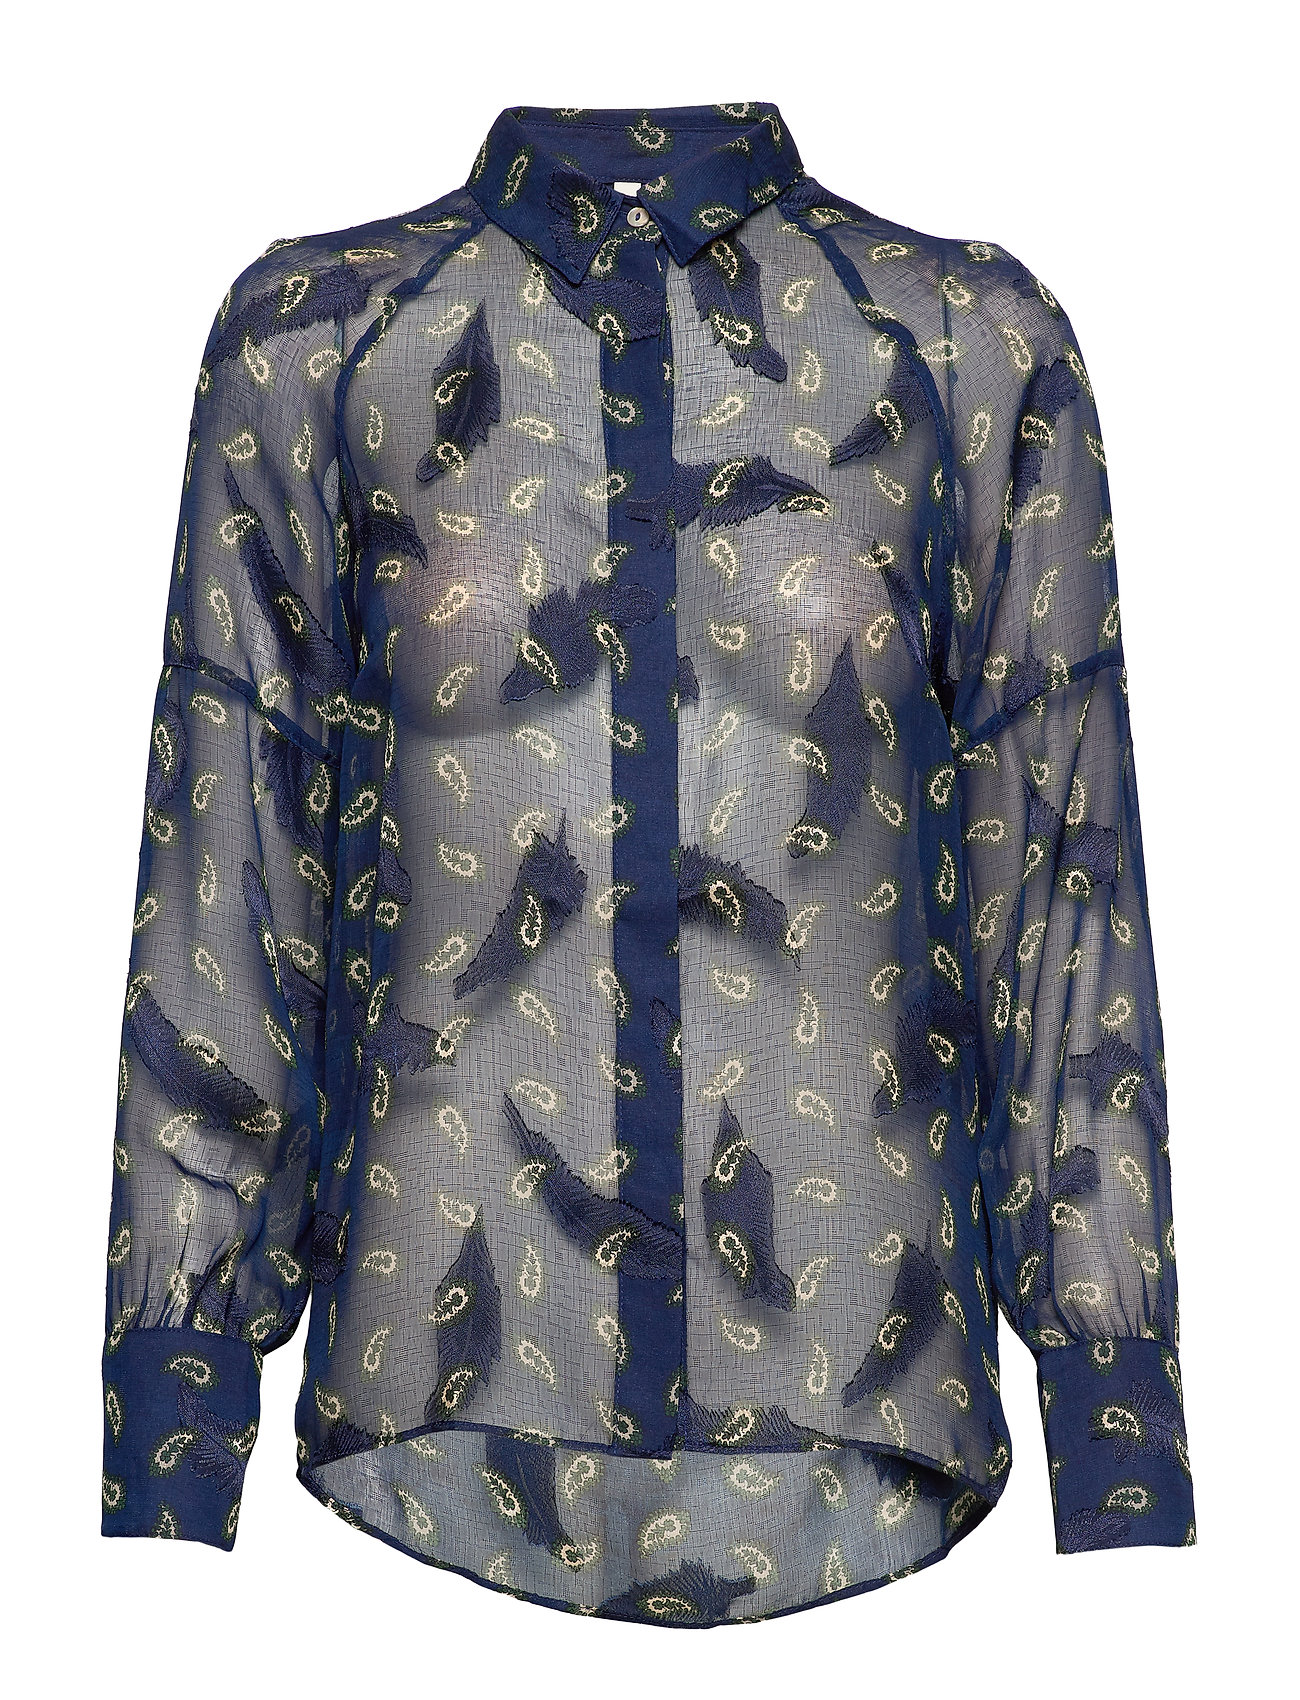 Pulz Jeans PZGERTRUD Shirt - BLUE MARINE